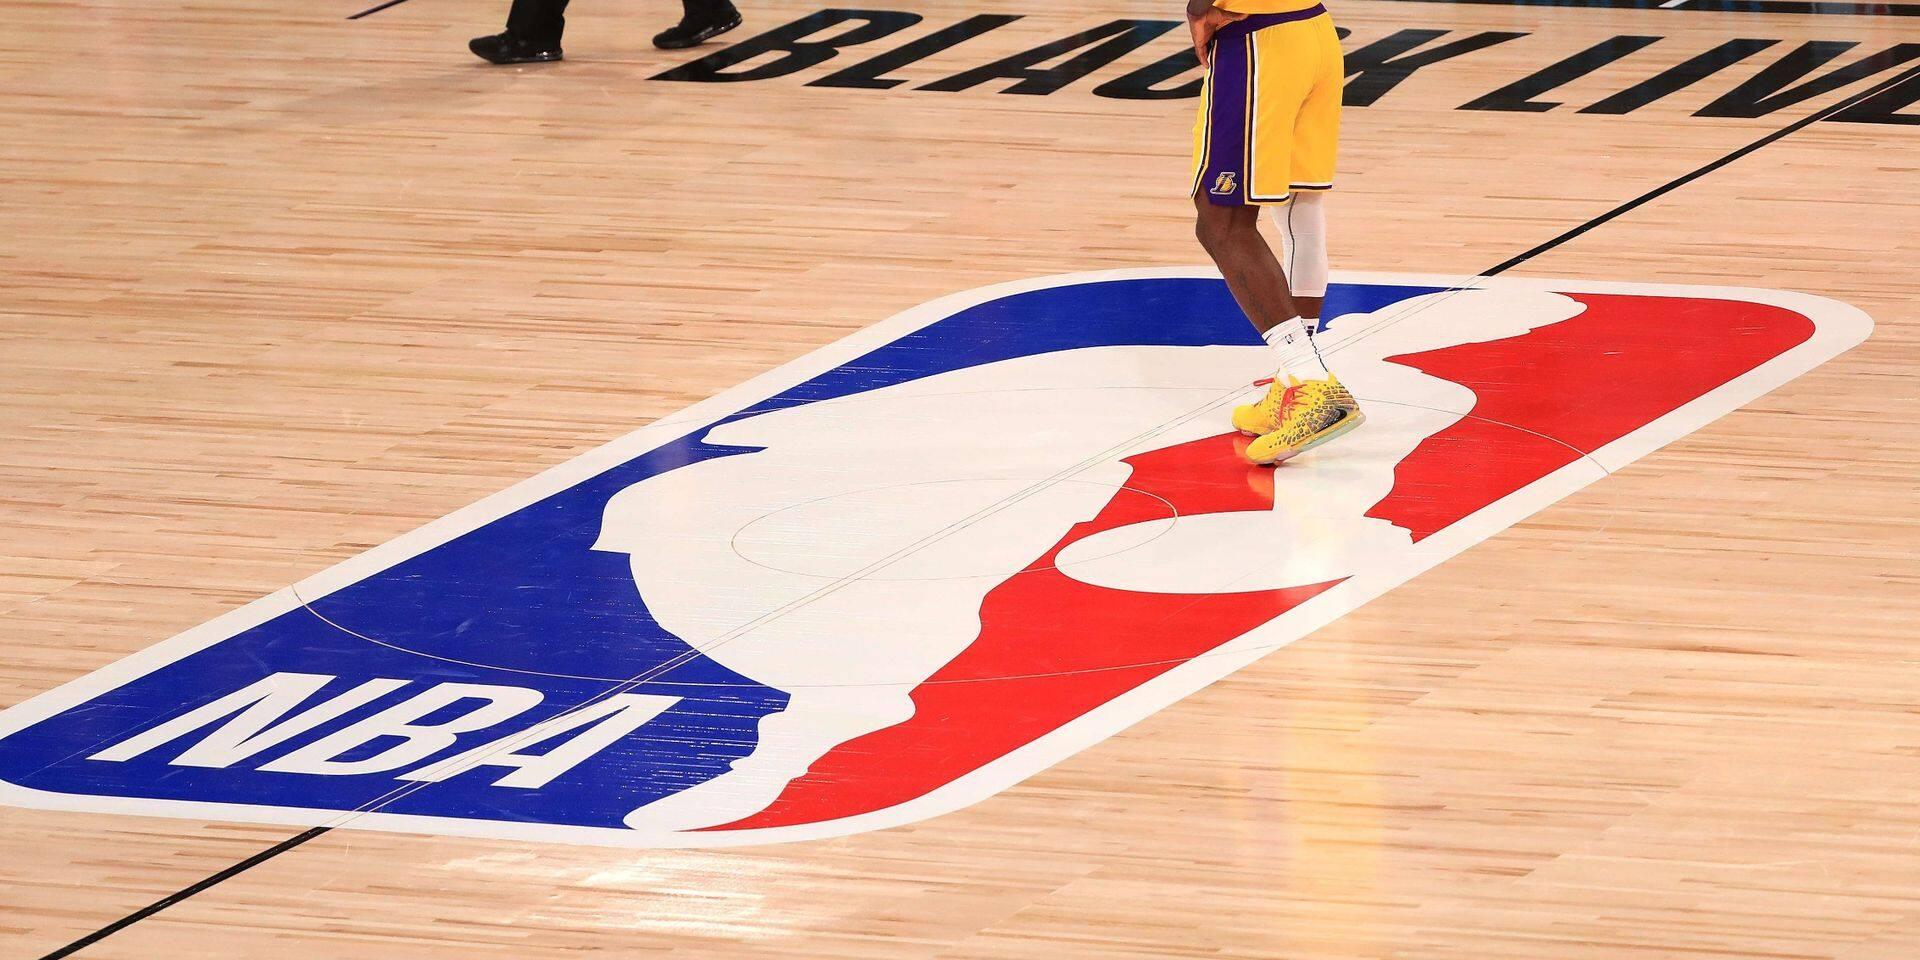 NBA: Toronto enchaîne, Denver se reprend, Warren brille encore